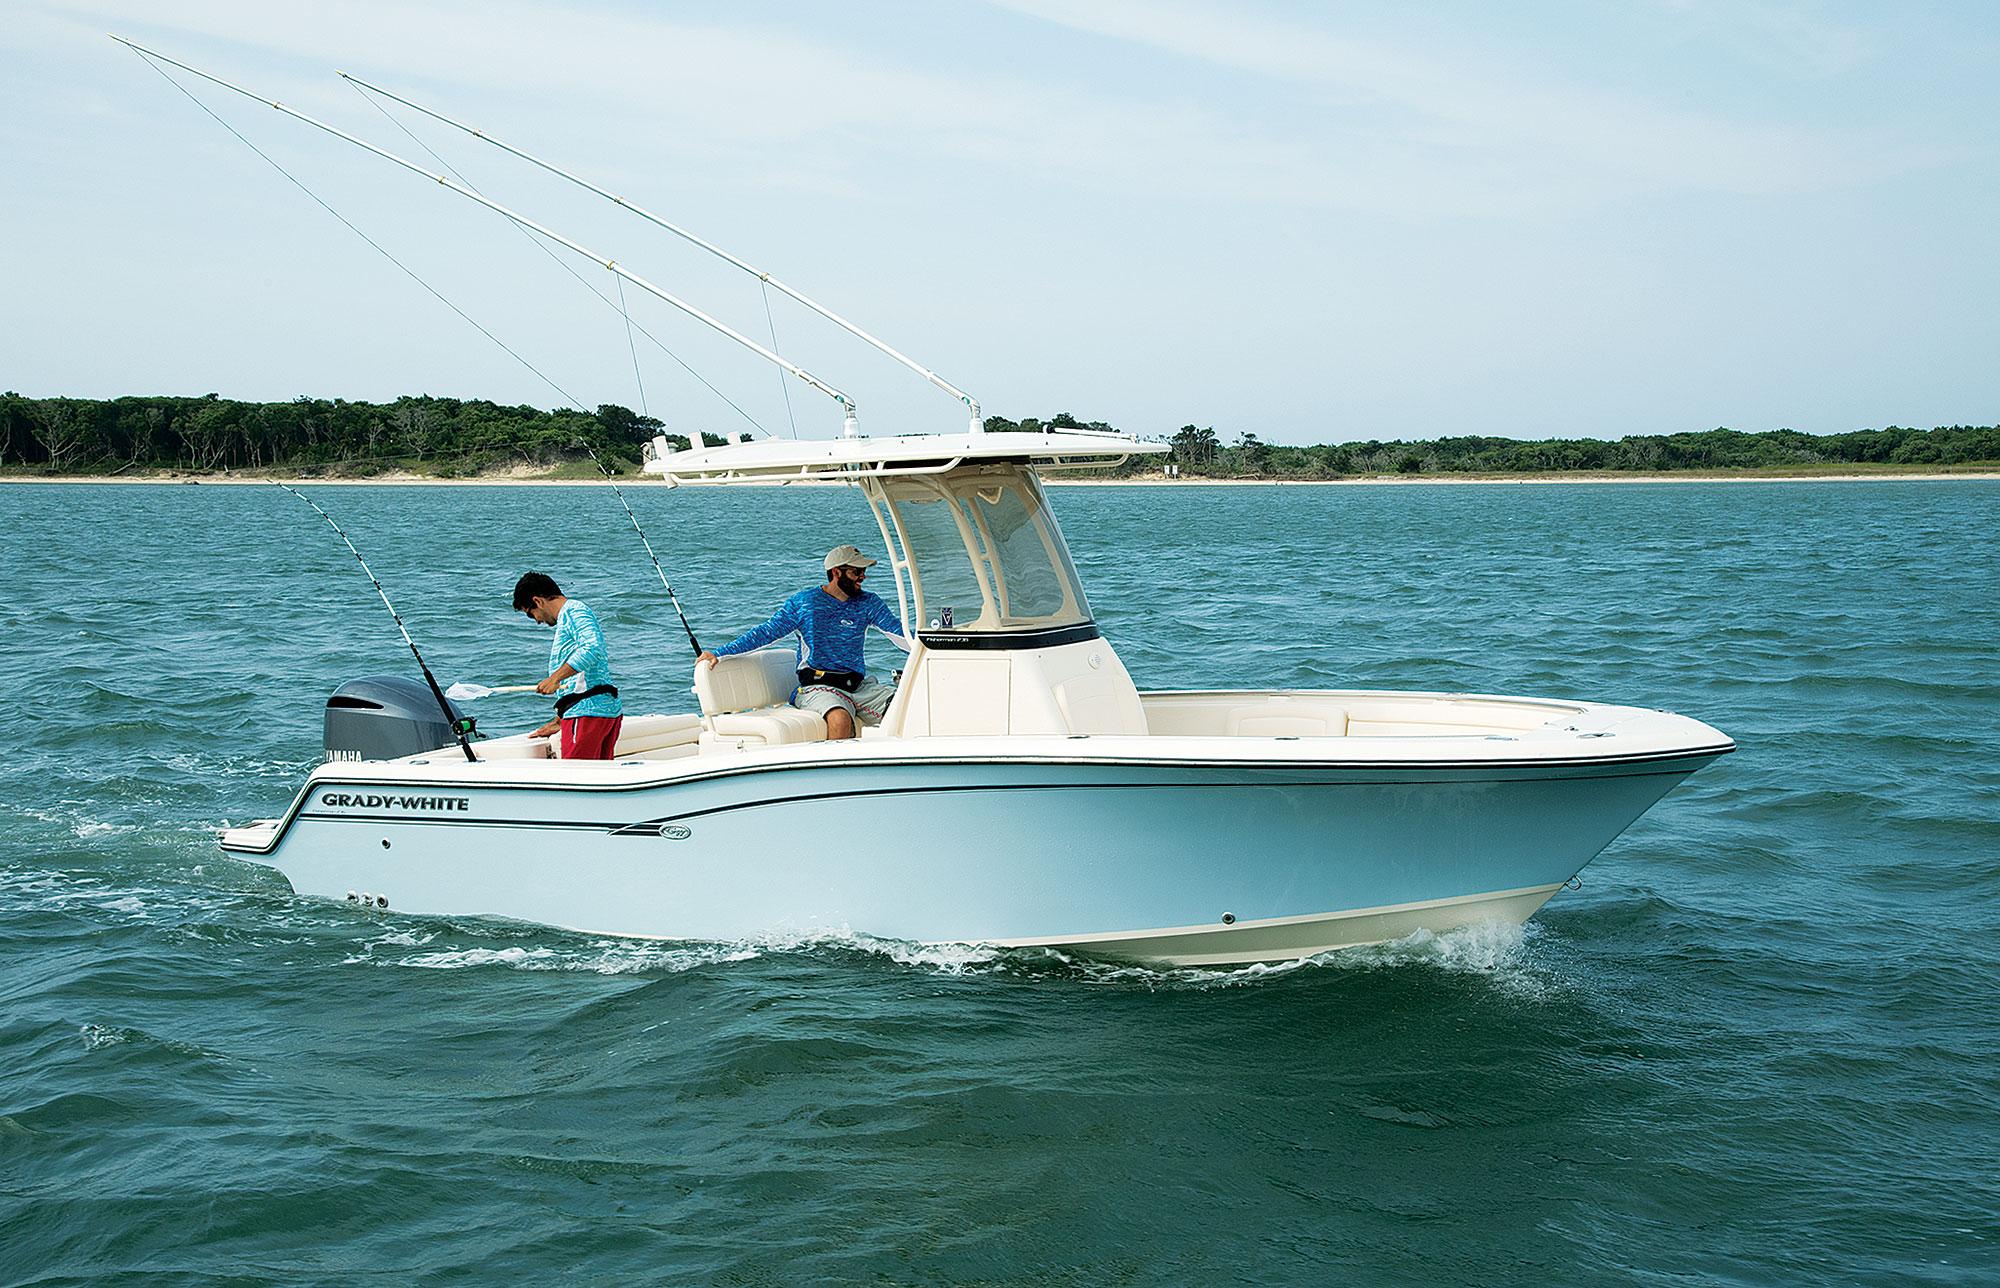 Grady-White Fisherman 236 Center Console First Glance